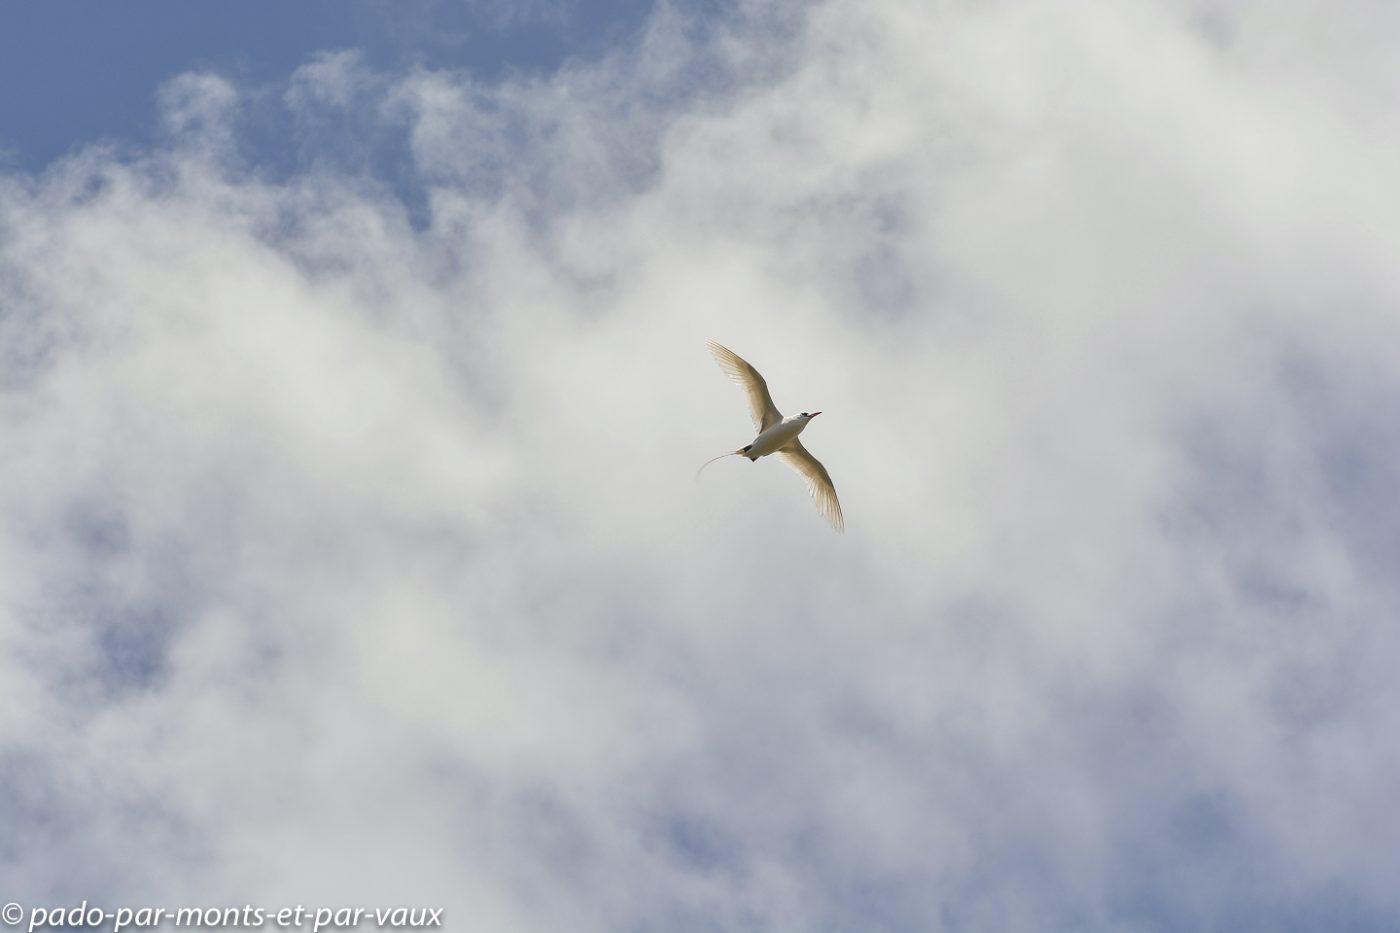 Kauai  - Kilauea point - Phaéton à brins blancs